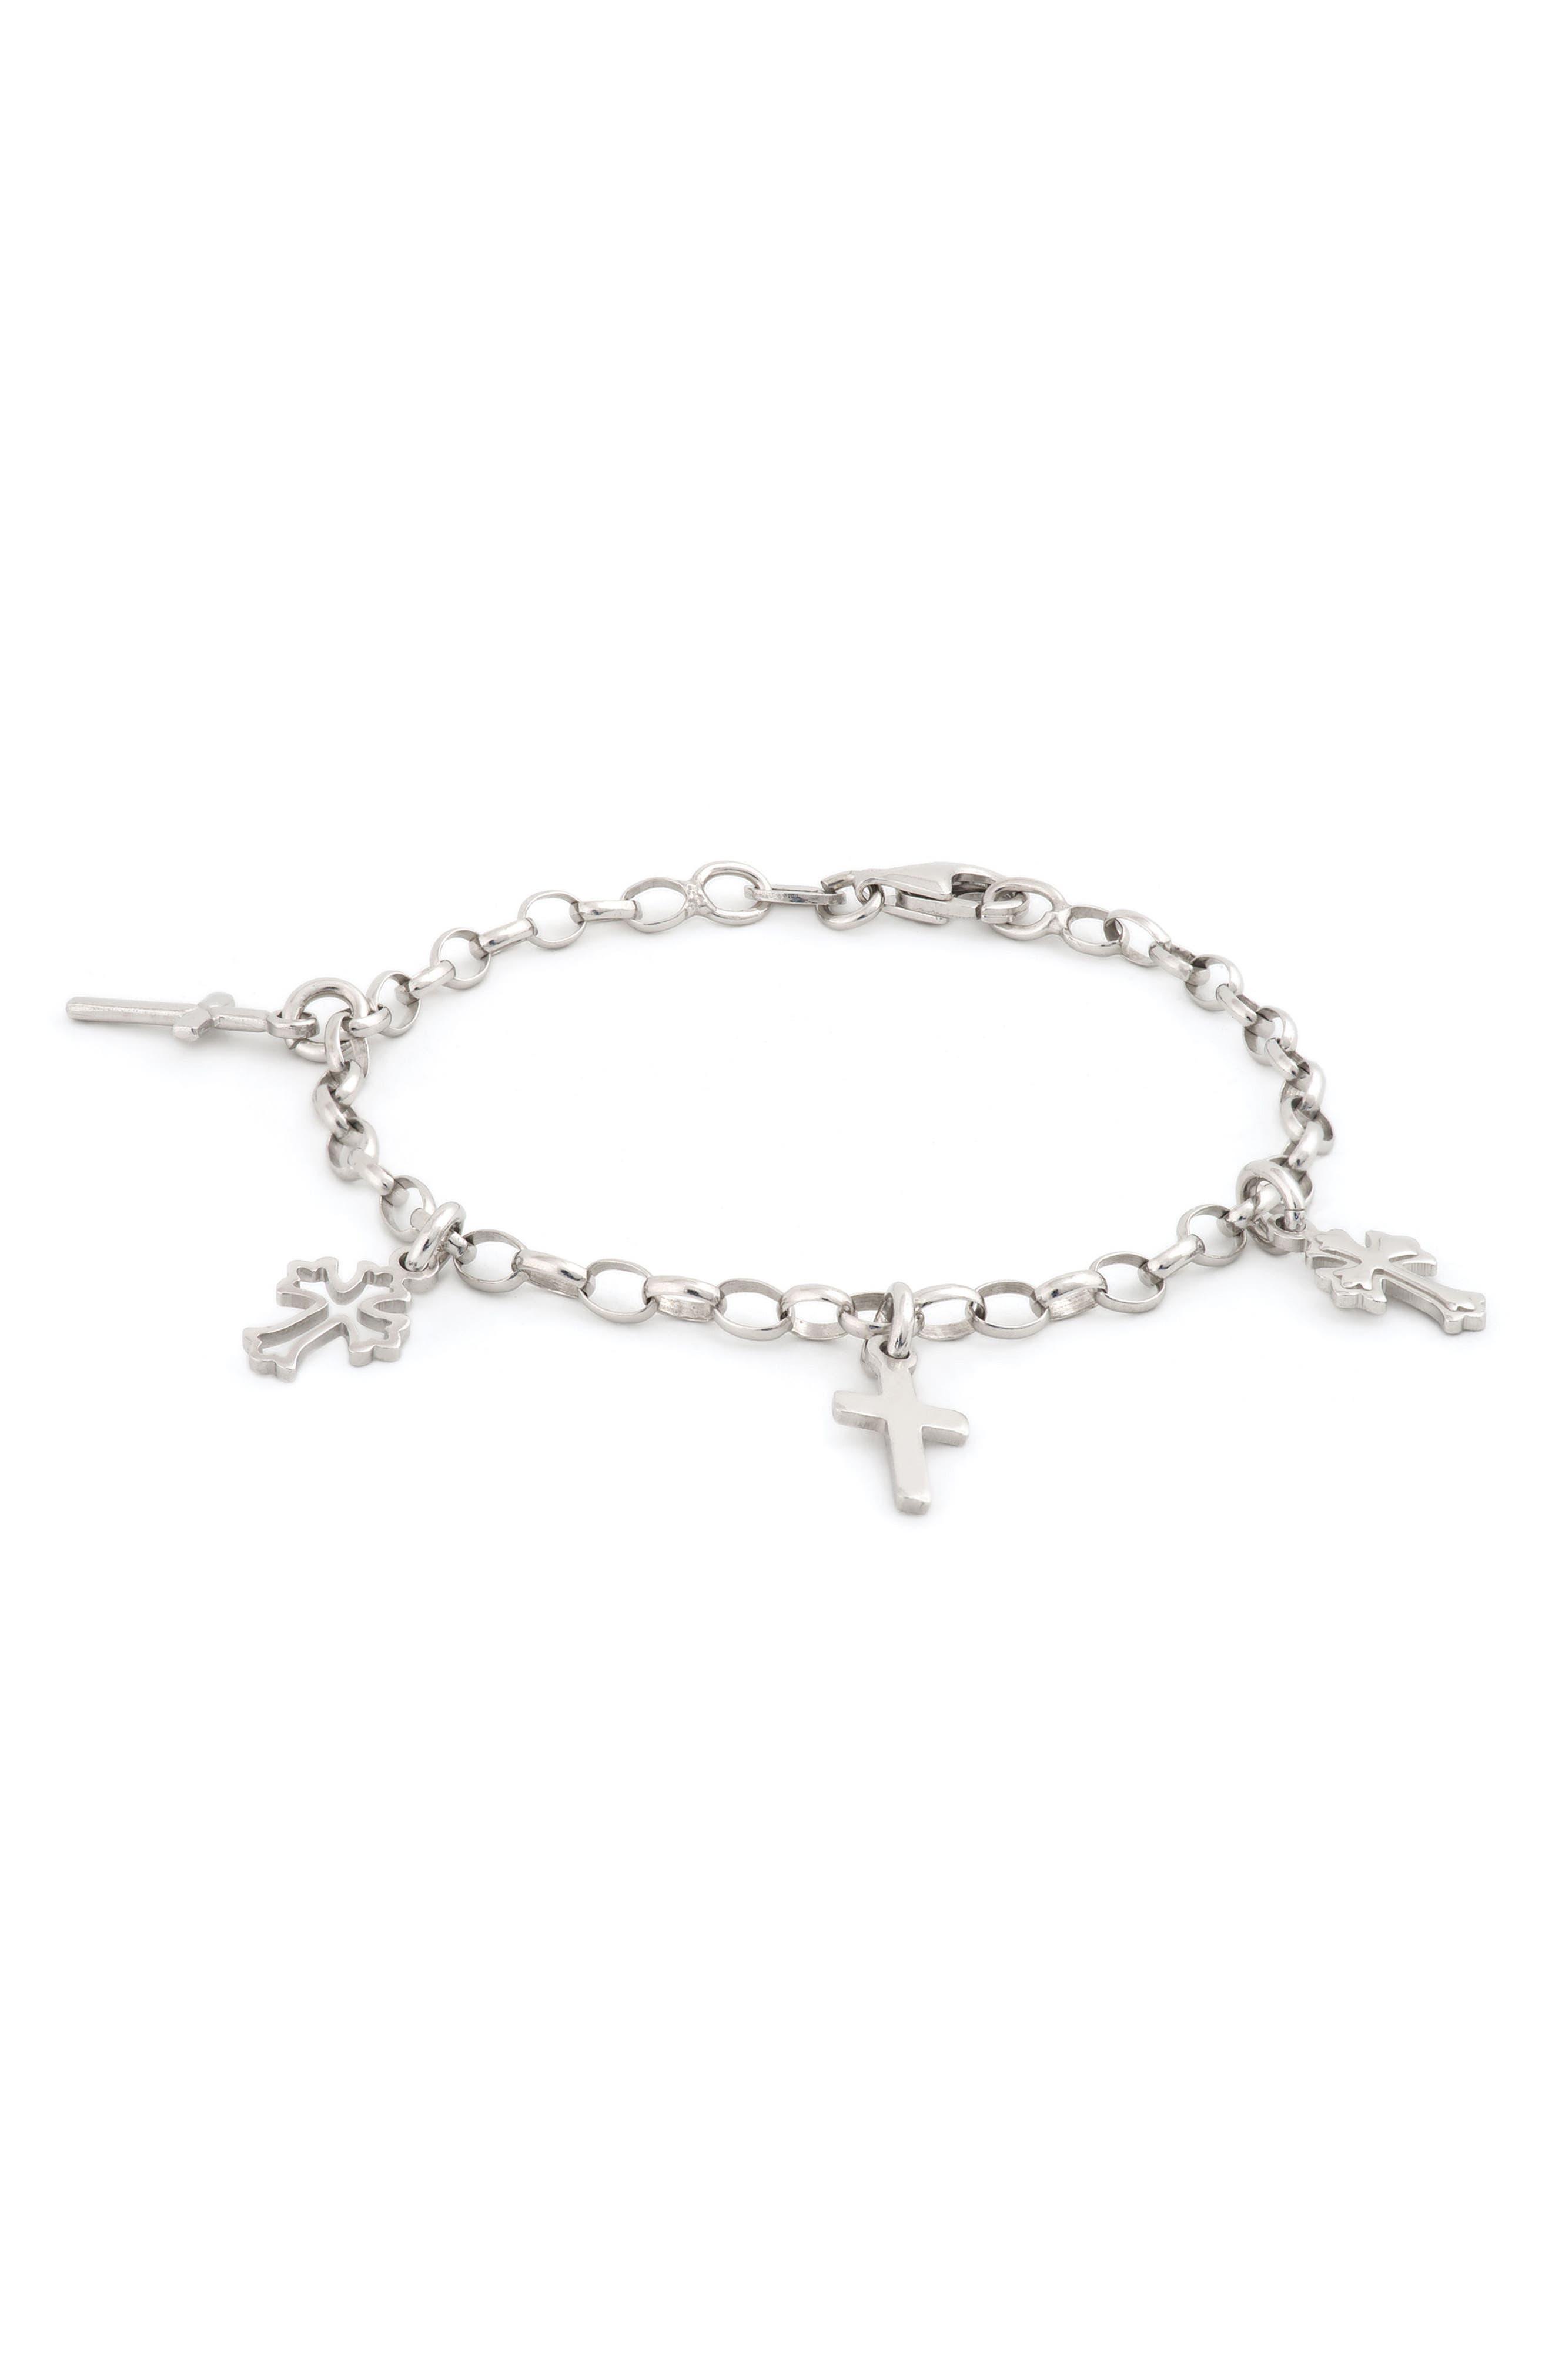 Sterling Silver Cross Bracelet,                             Main thumbnail 1, color,                             040